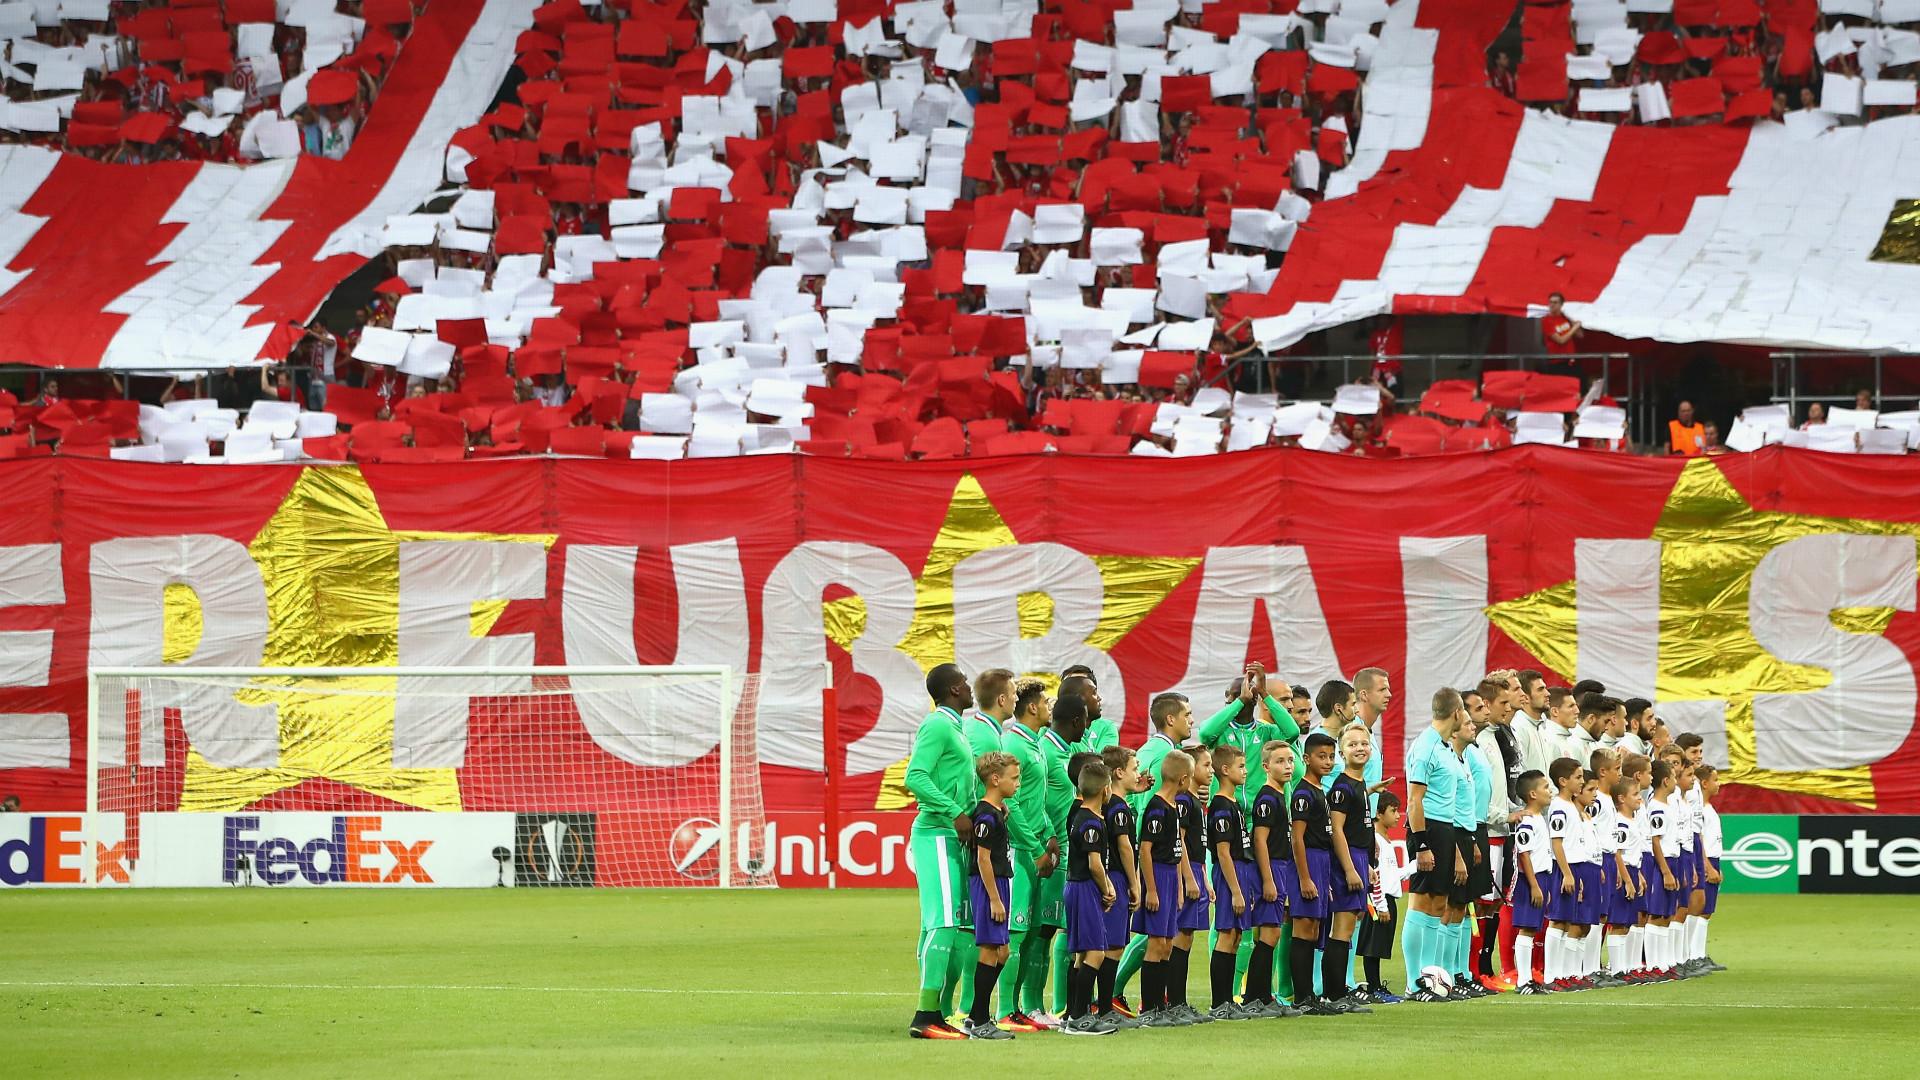 europa league aktuelle ergebnisse